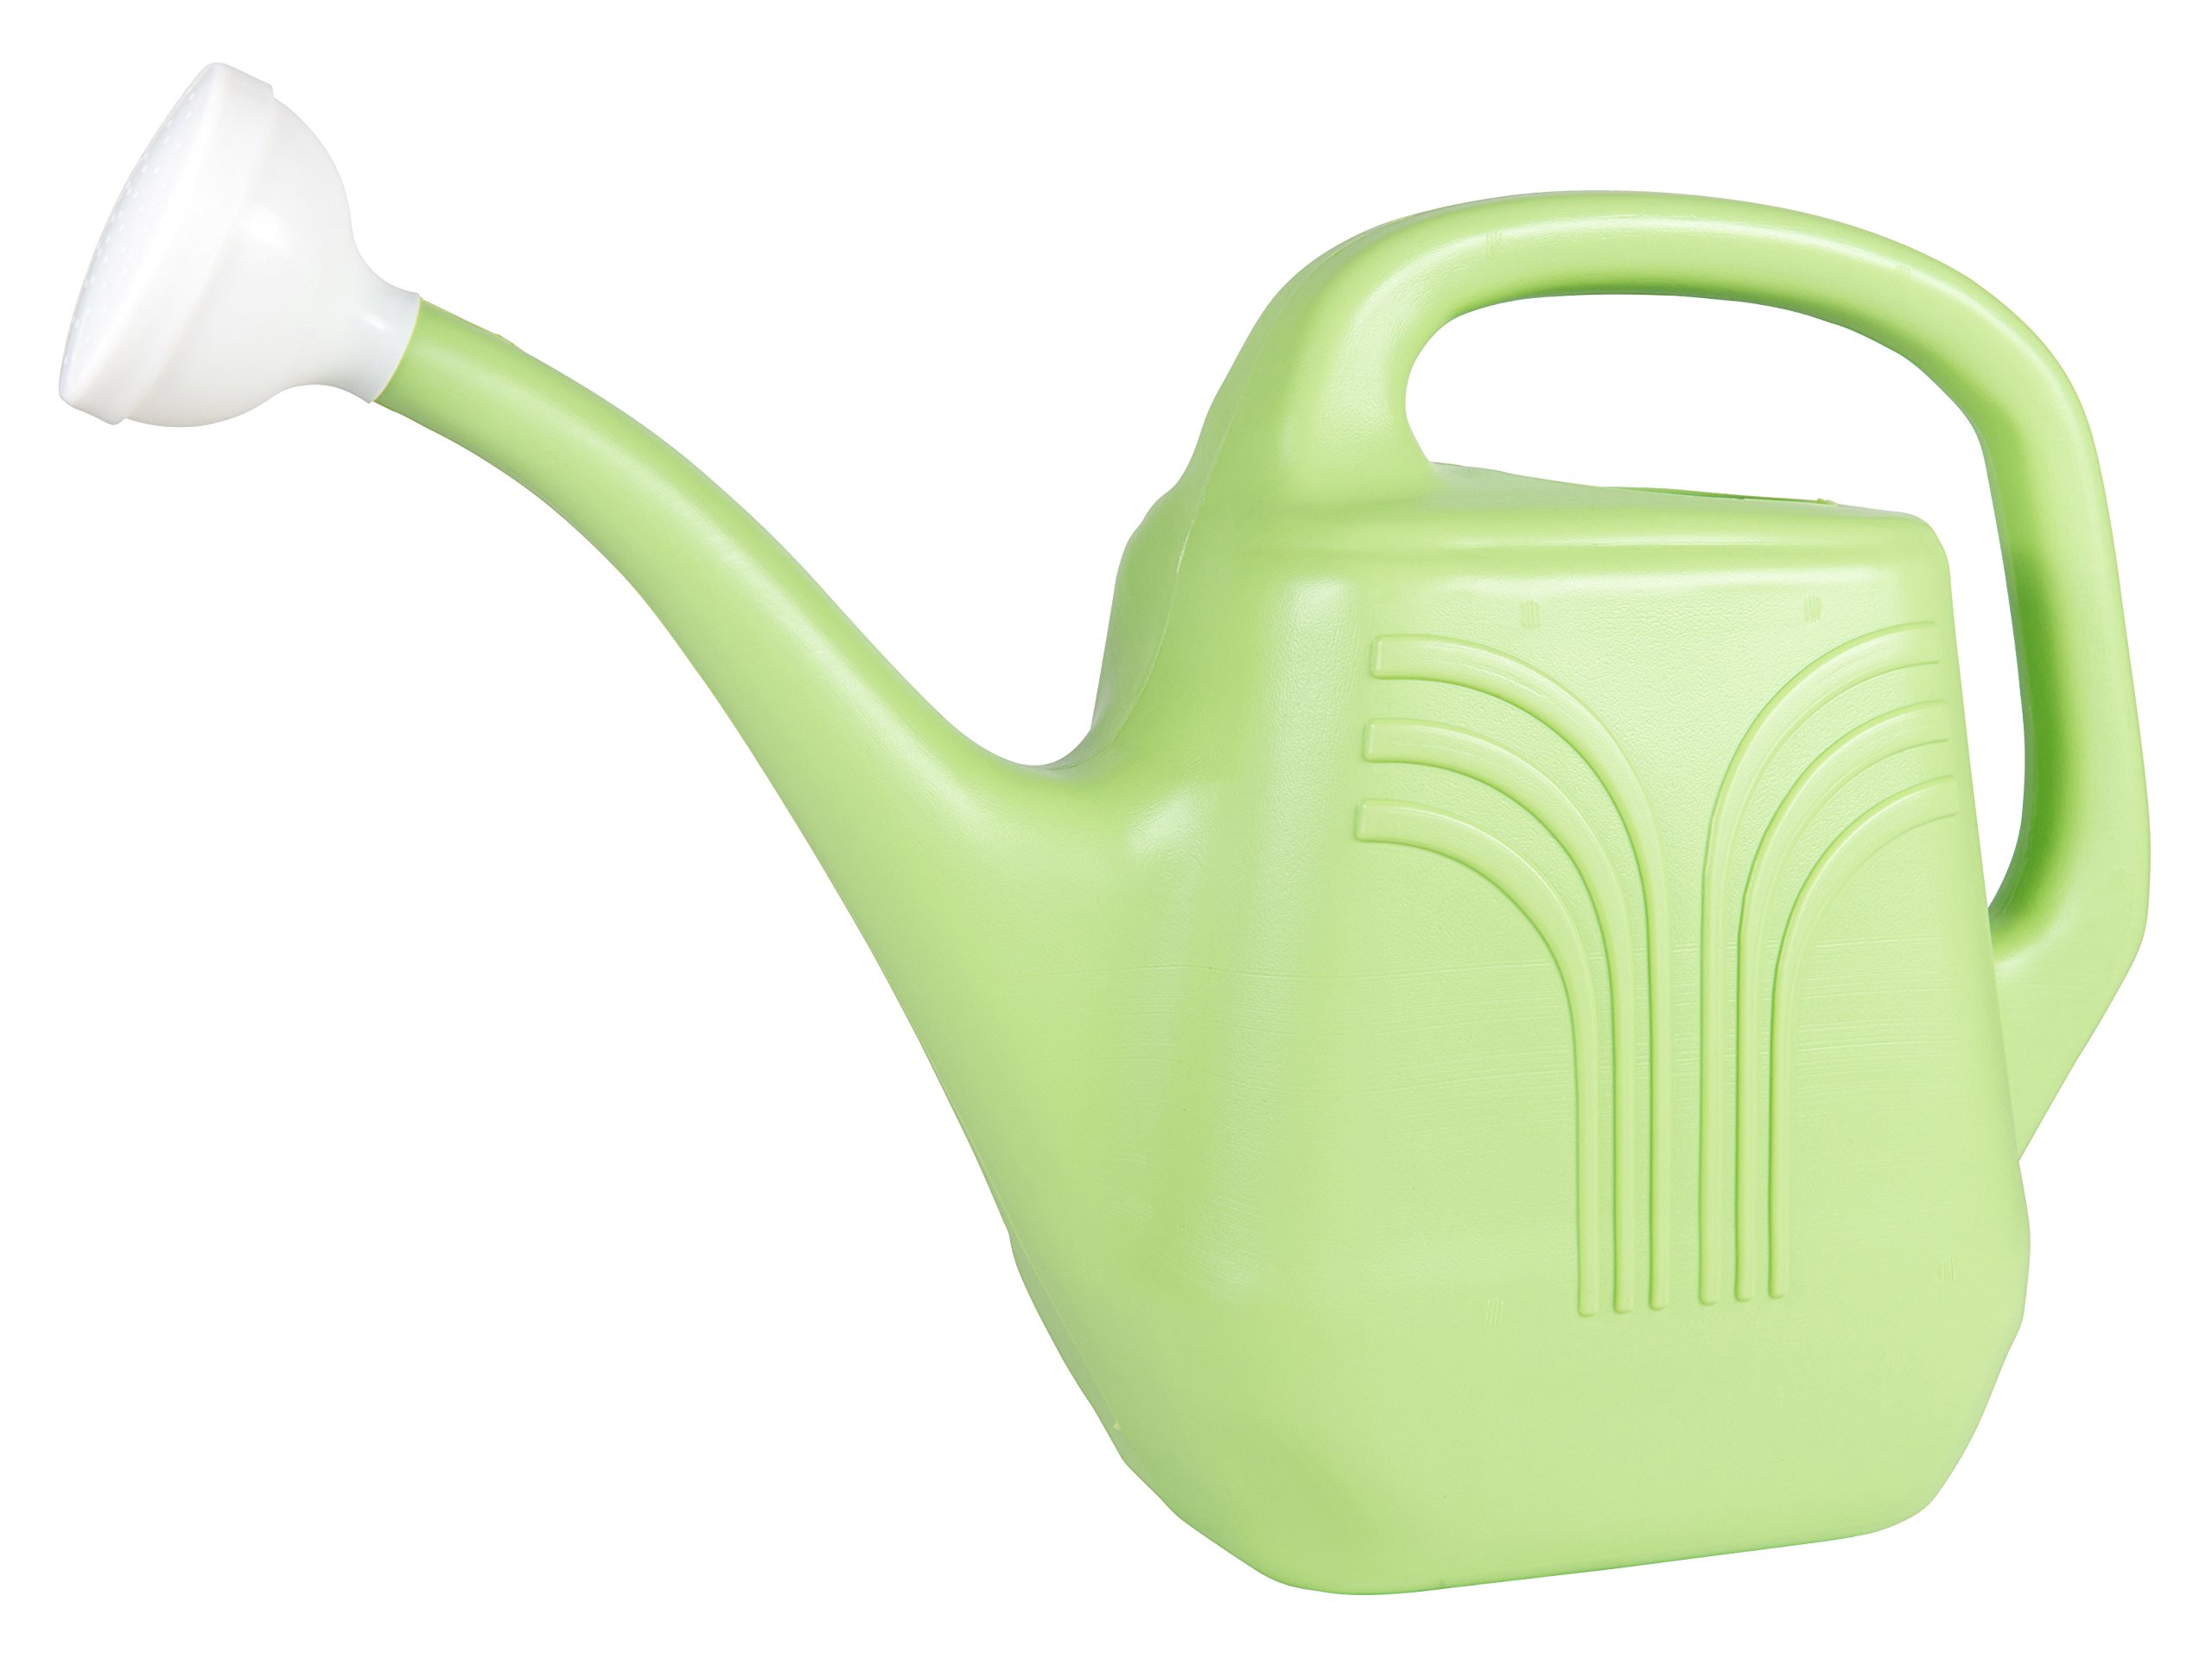 Bloem Classic JW Watering Can, 2 Gallon, Honey Dew (JW82-25)